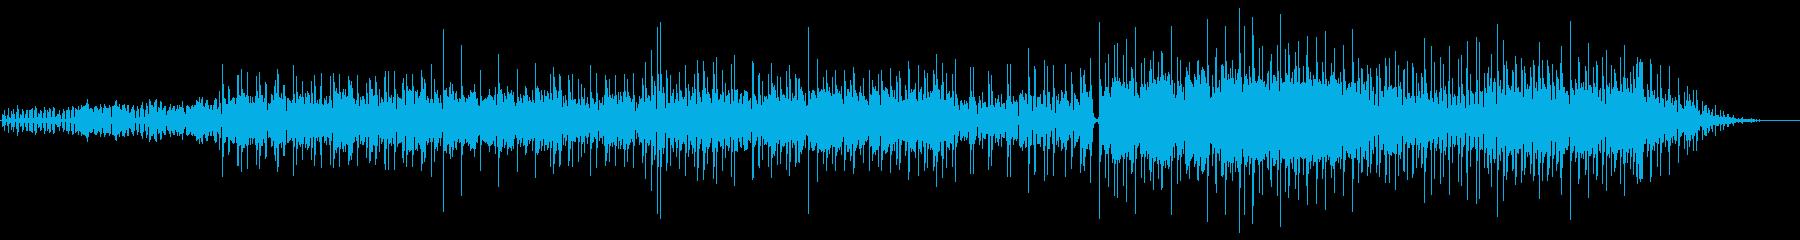 Jazzyな雰囲気のトリップソングの再生済みの波形